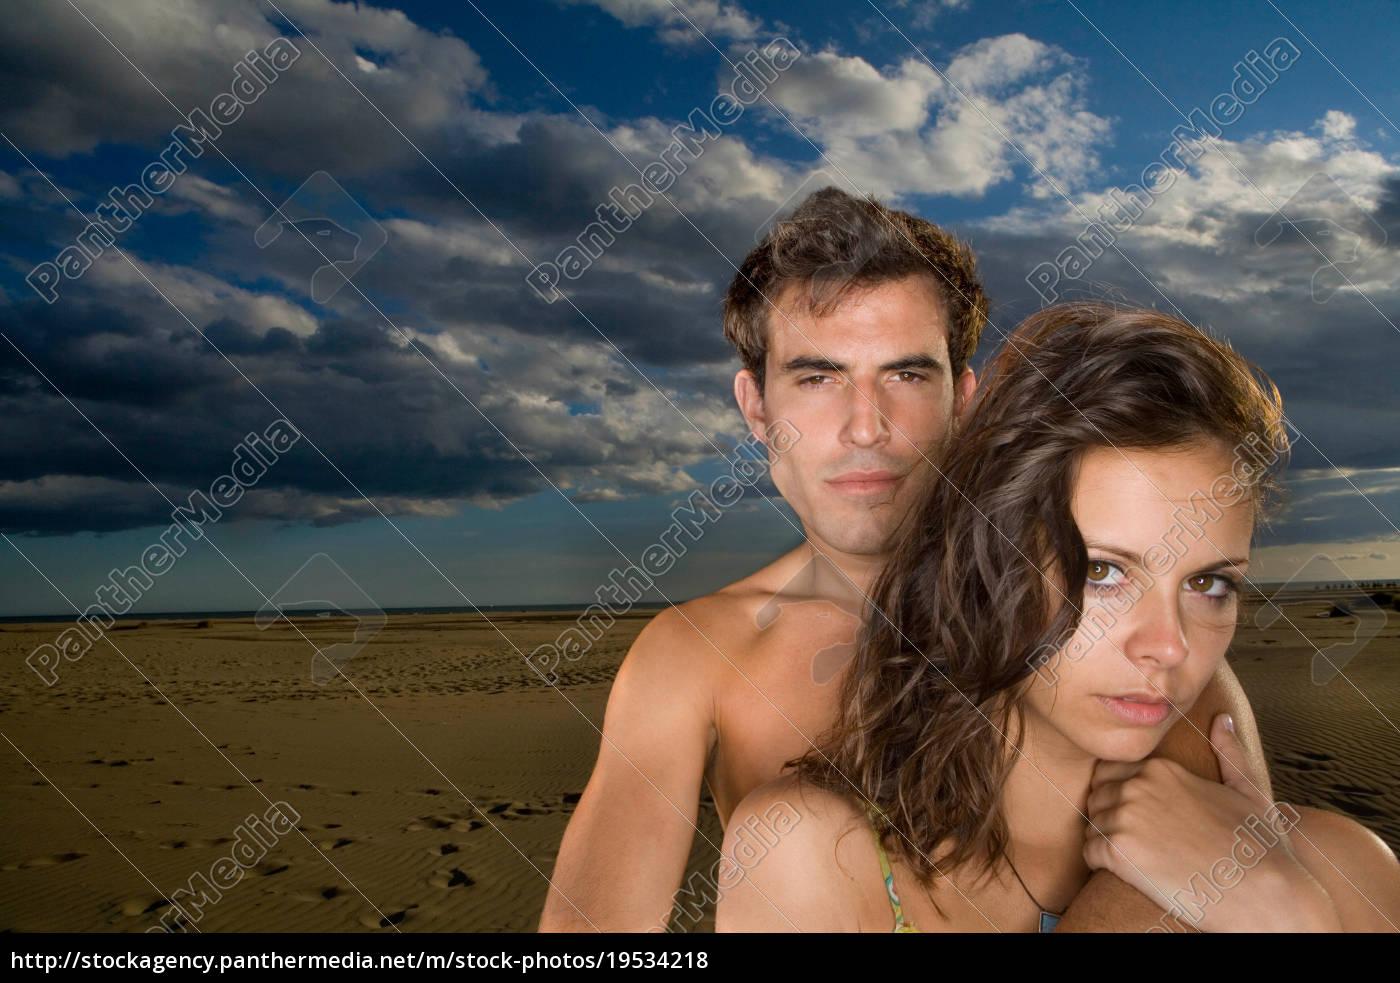 Nude women and girls uk